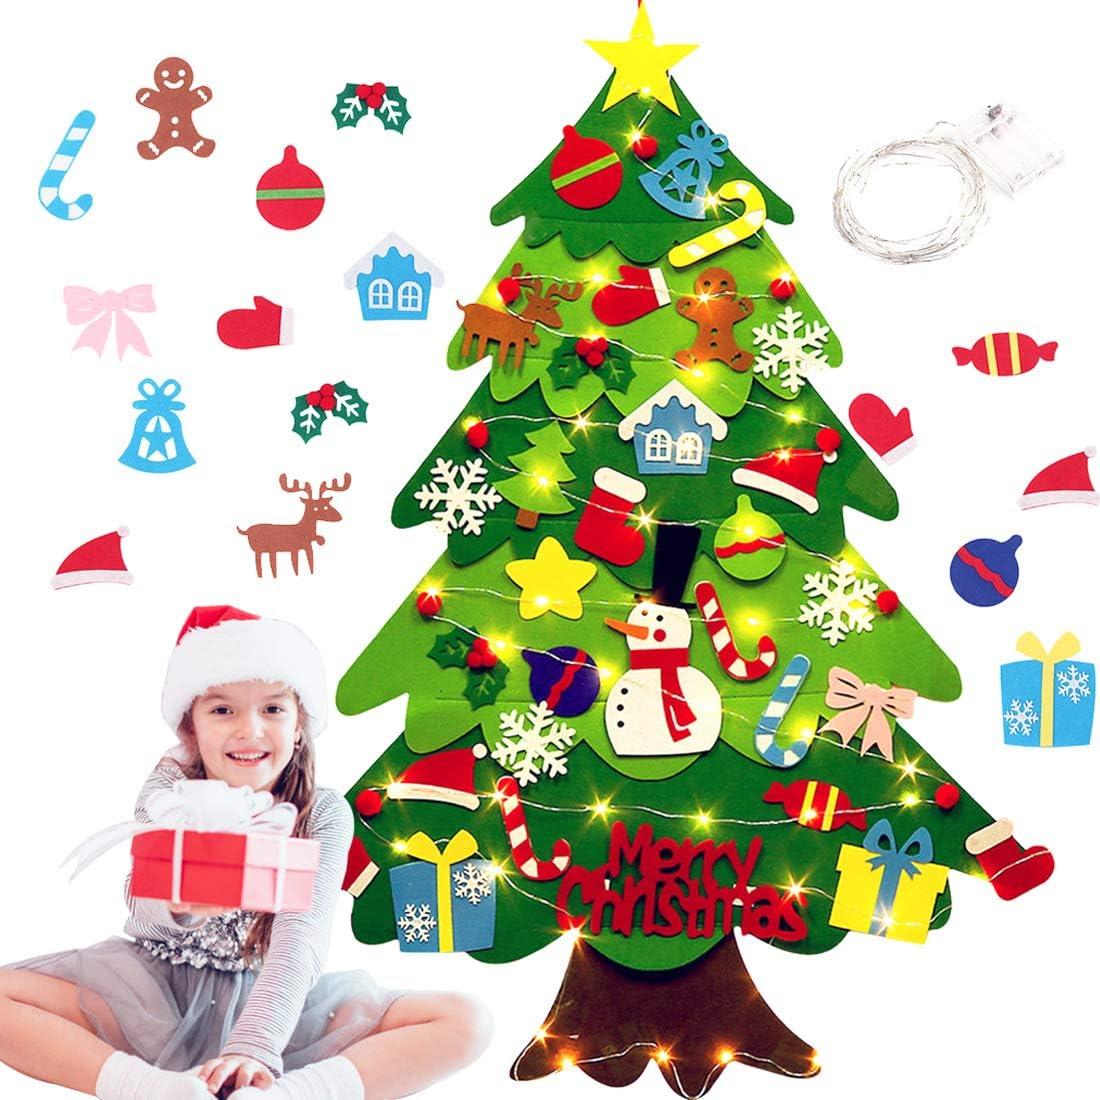 JUSTDOLIFE DIY Felt Christmas Tree, DIY Felt Christmas Tree with 32 Tree Toppers Xmas Ornaments and Light String Wall Hanging Felt Tree for Home Xmas Gift Decor